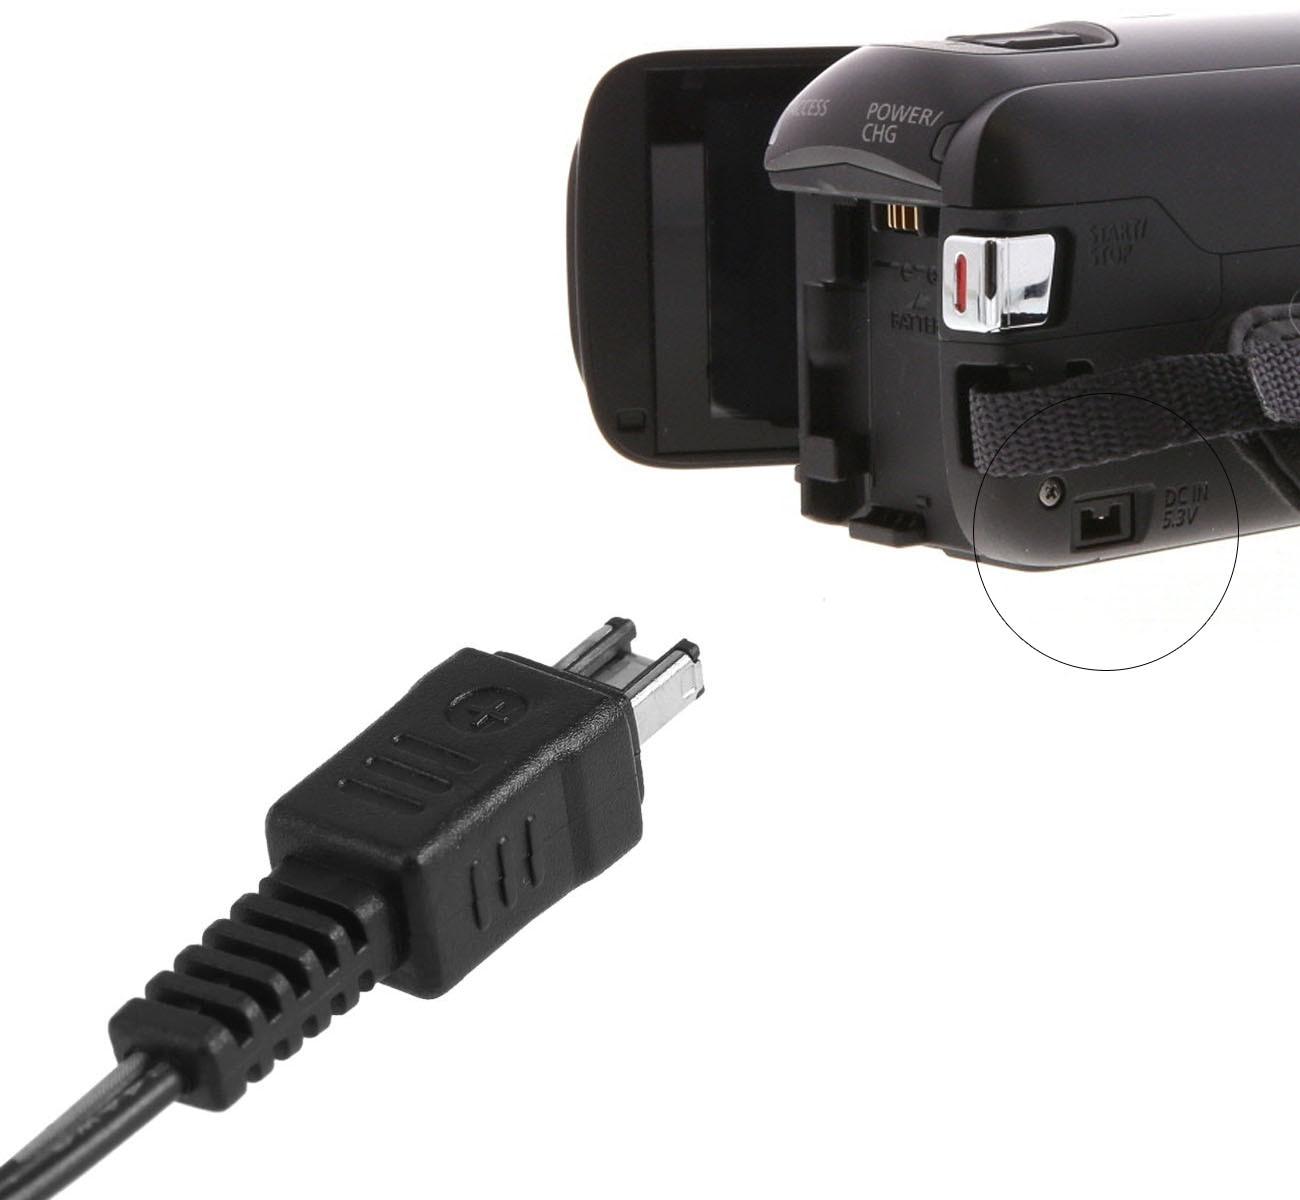 BP-718 BP-727 1600mAh bateria Repuesto CELLONIC 2X Bater/ía Compatible con Canon LEGRIA HF R806 R86 HF R706 HF R606 HF R506 HF R406 HF R306 R36 VIXIA HF R500 HF R52 R50 HF R400 R40 HF R300 HF M500